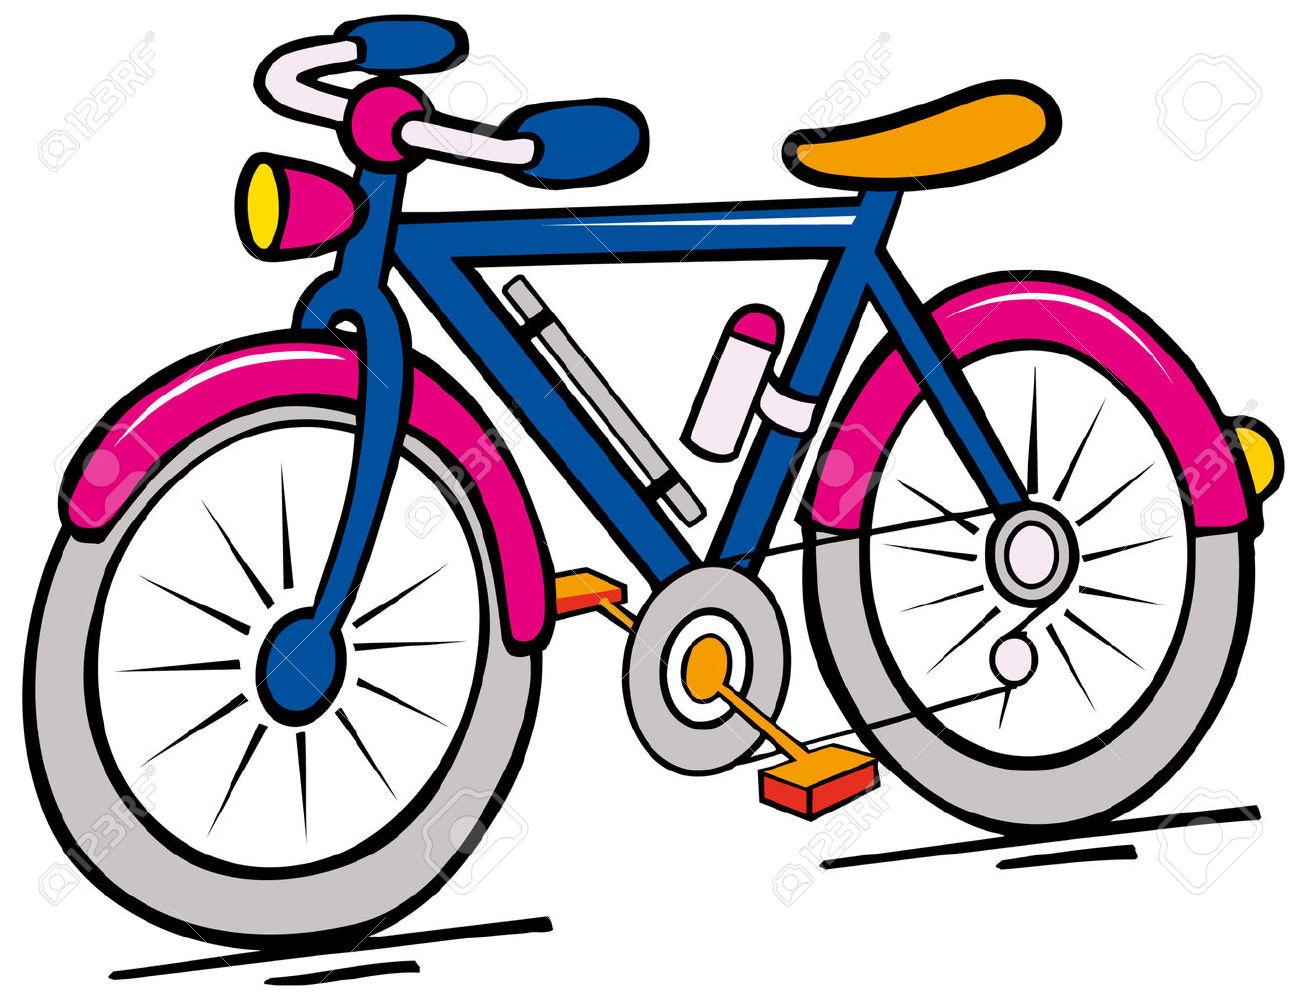 Bike Cartoon Clipart Free Download Best Bike Cartoon Clipart On